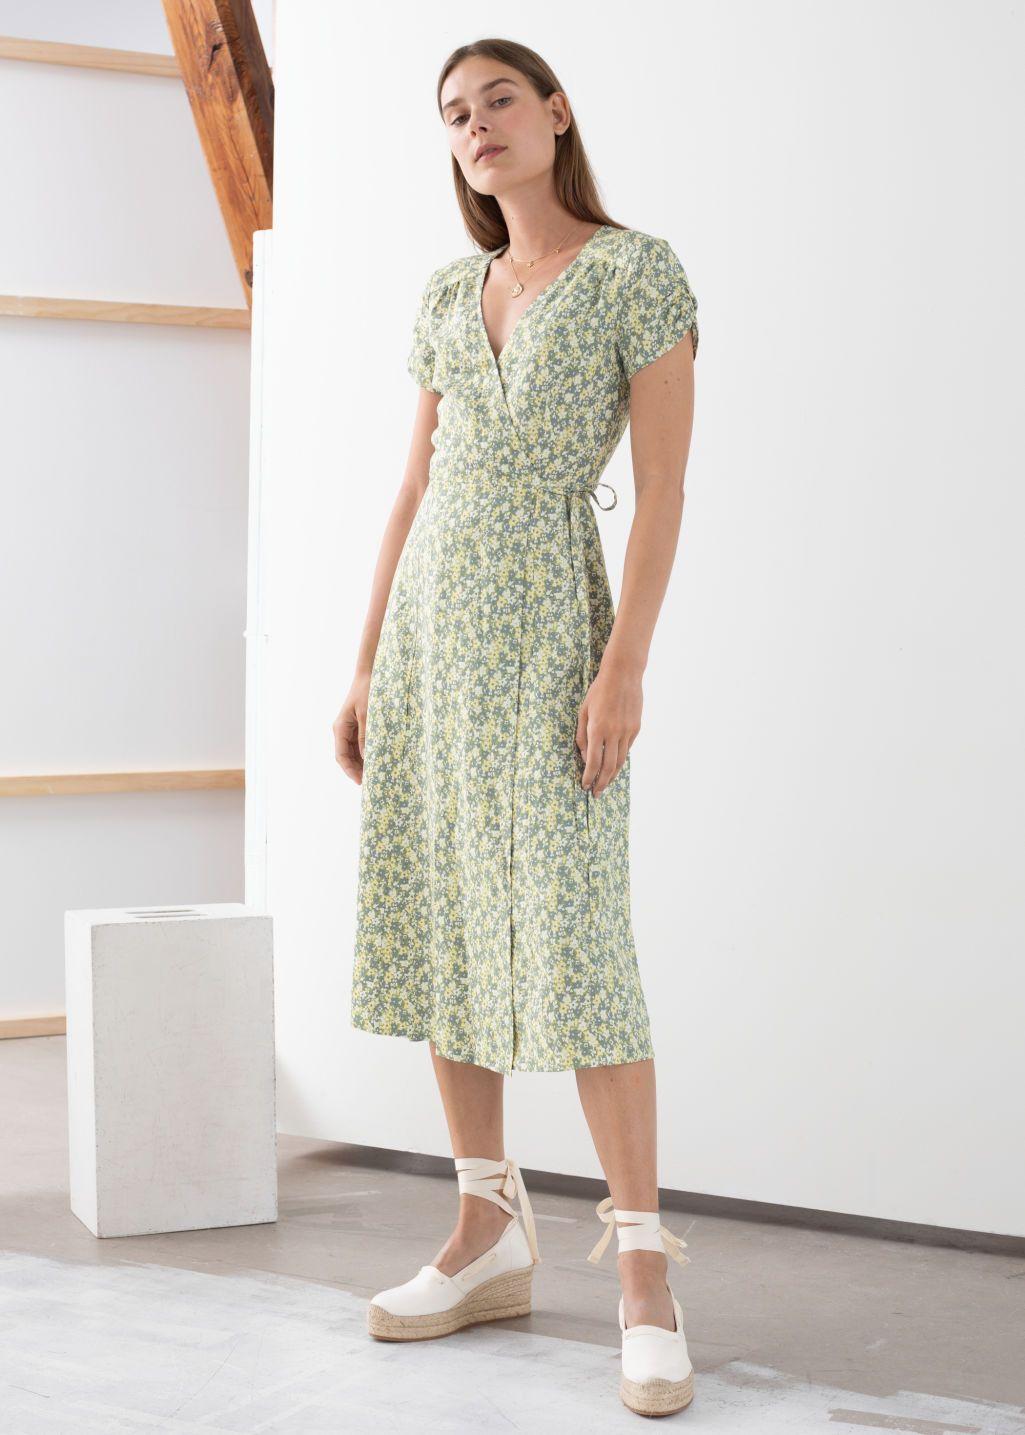 30++ Printed wrap dress info